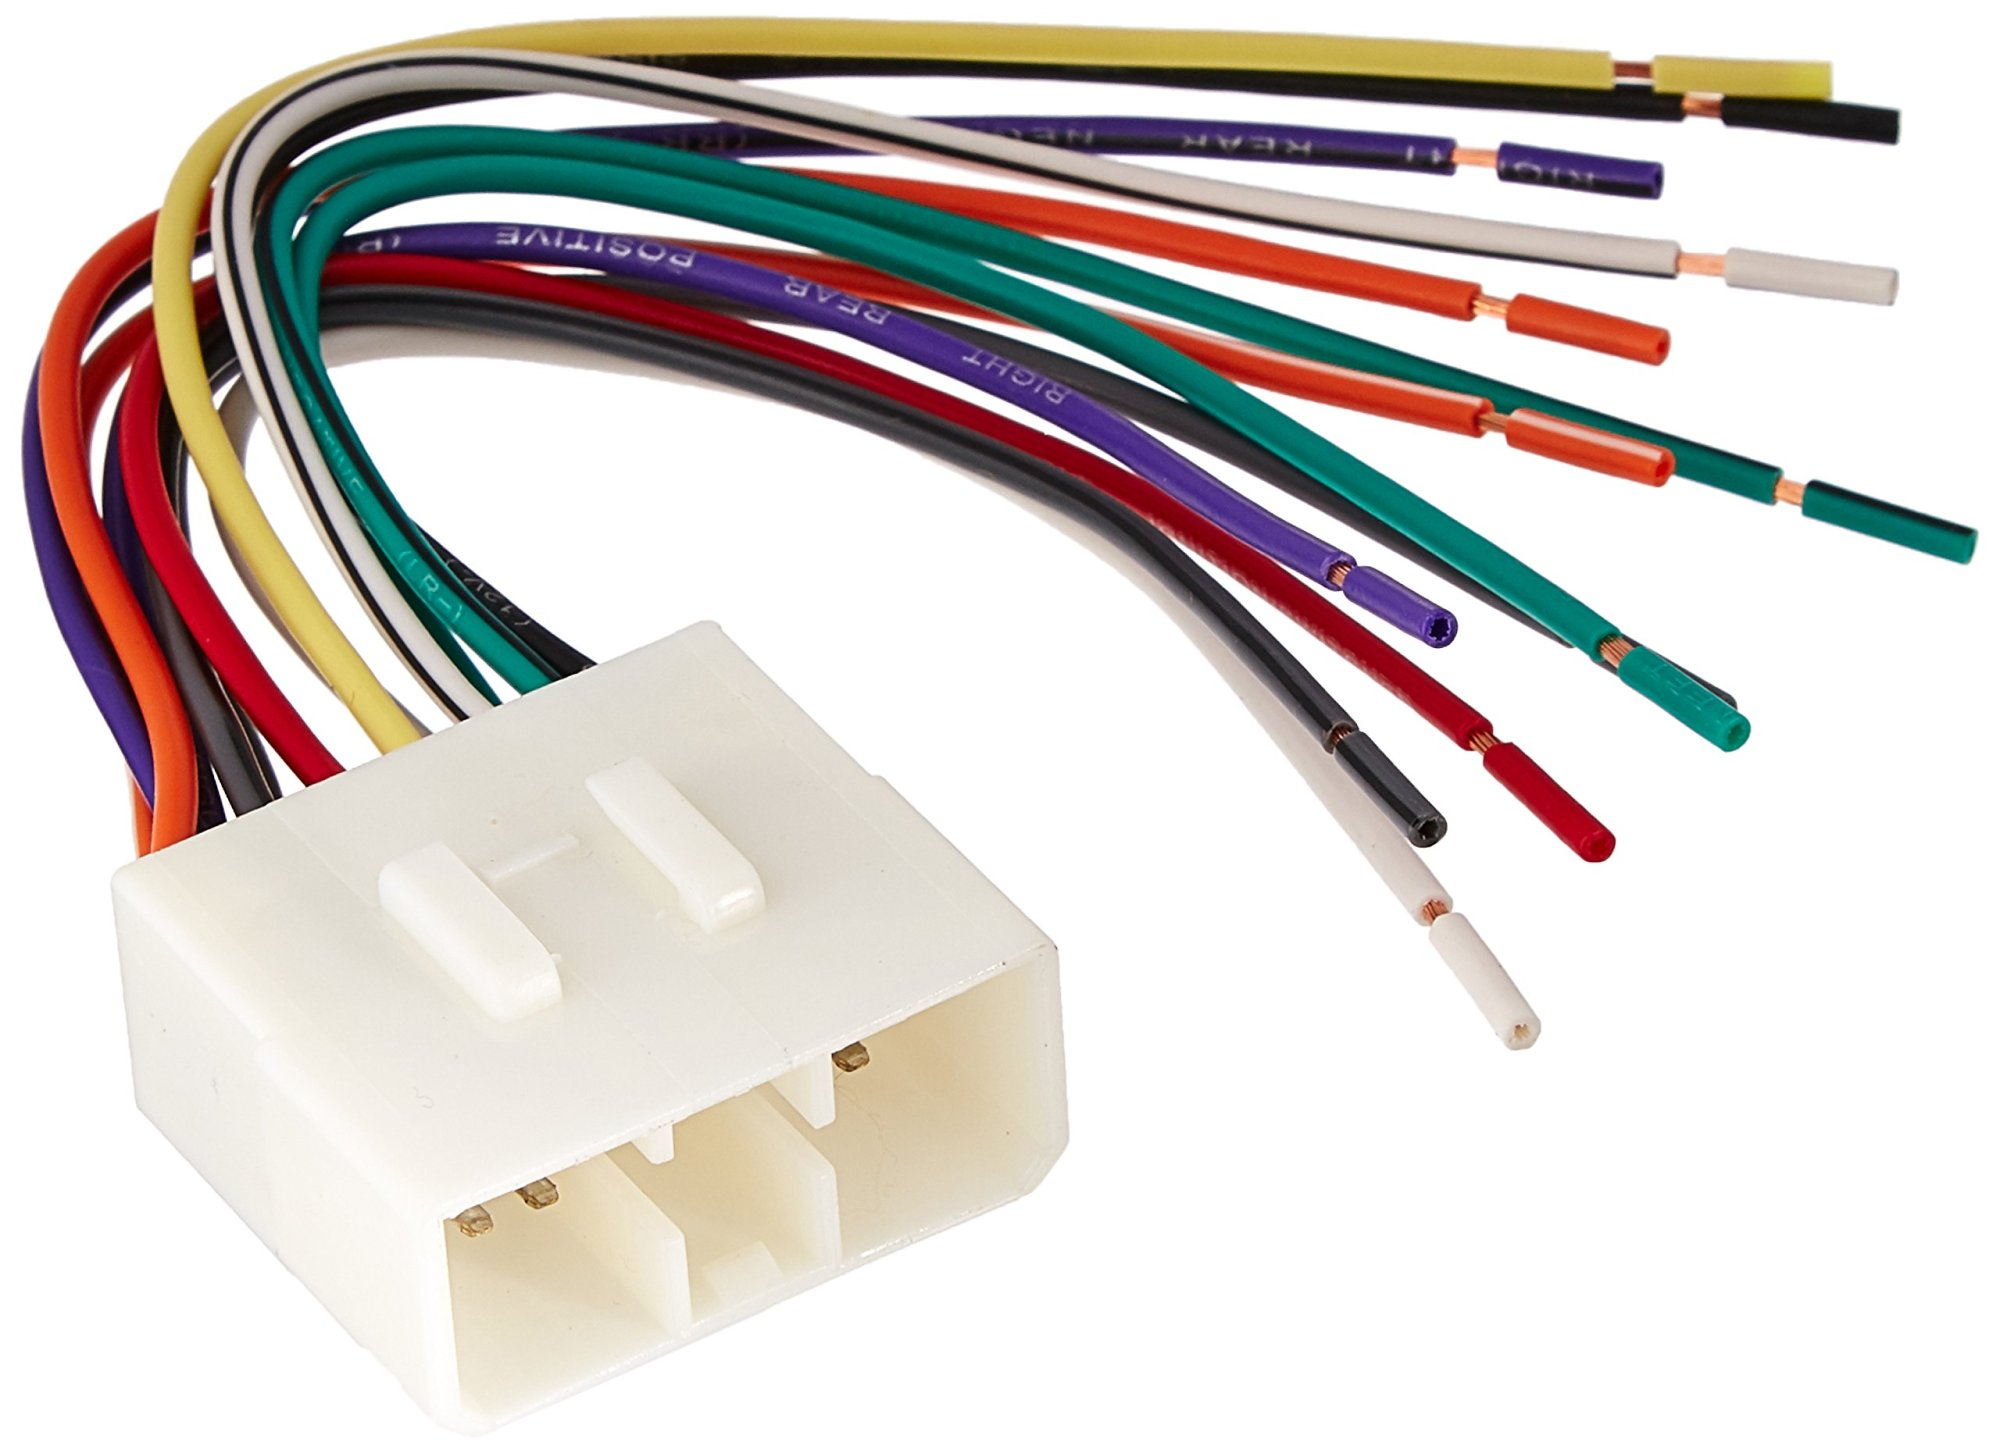 hight resolution of cheap scosche radio wiring harness find scosche radio wiring scosche wiring harness 1999 toyota